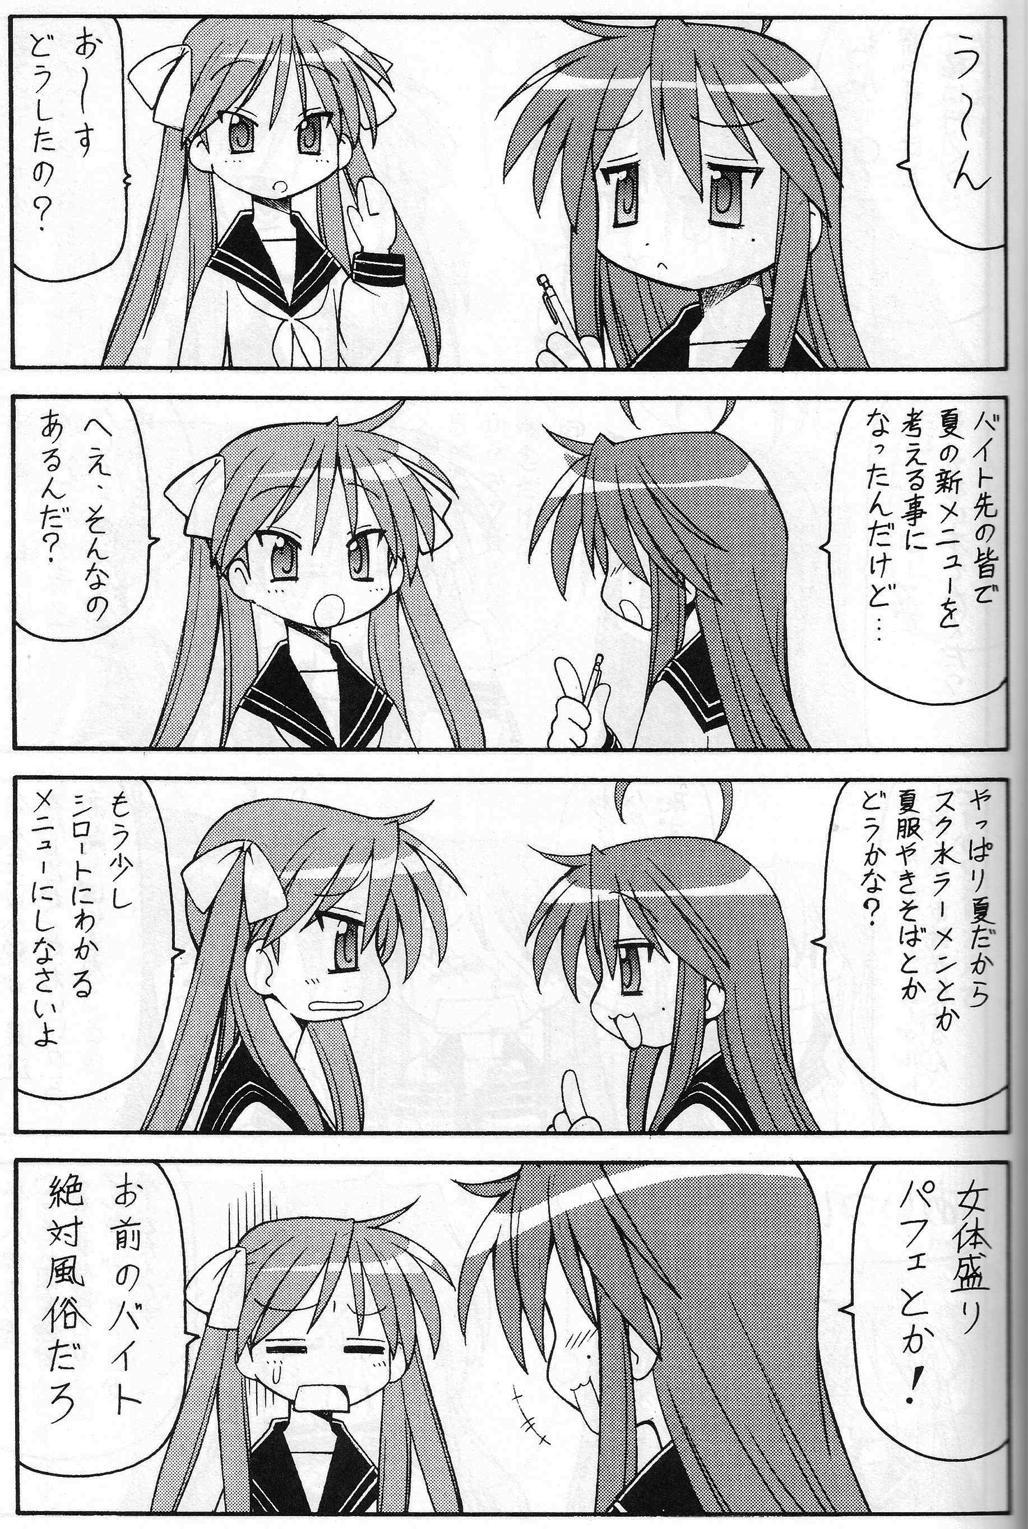 Yatteke! Sailor Fuku 1 25